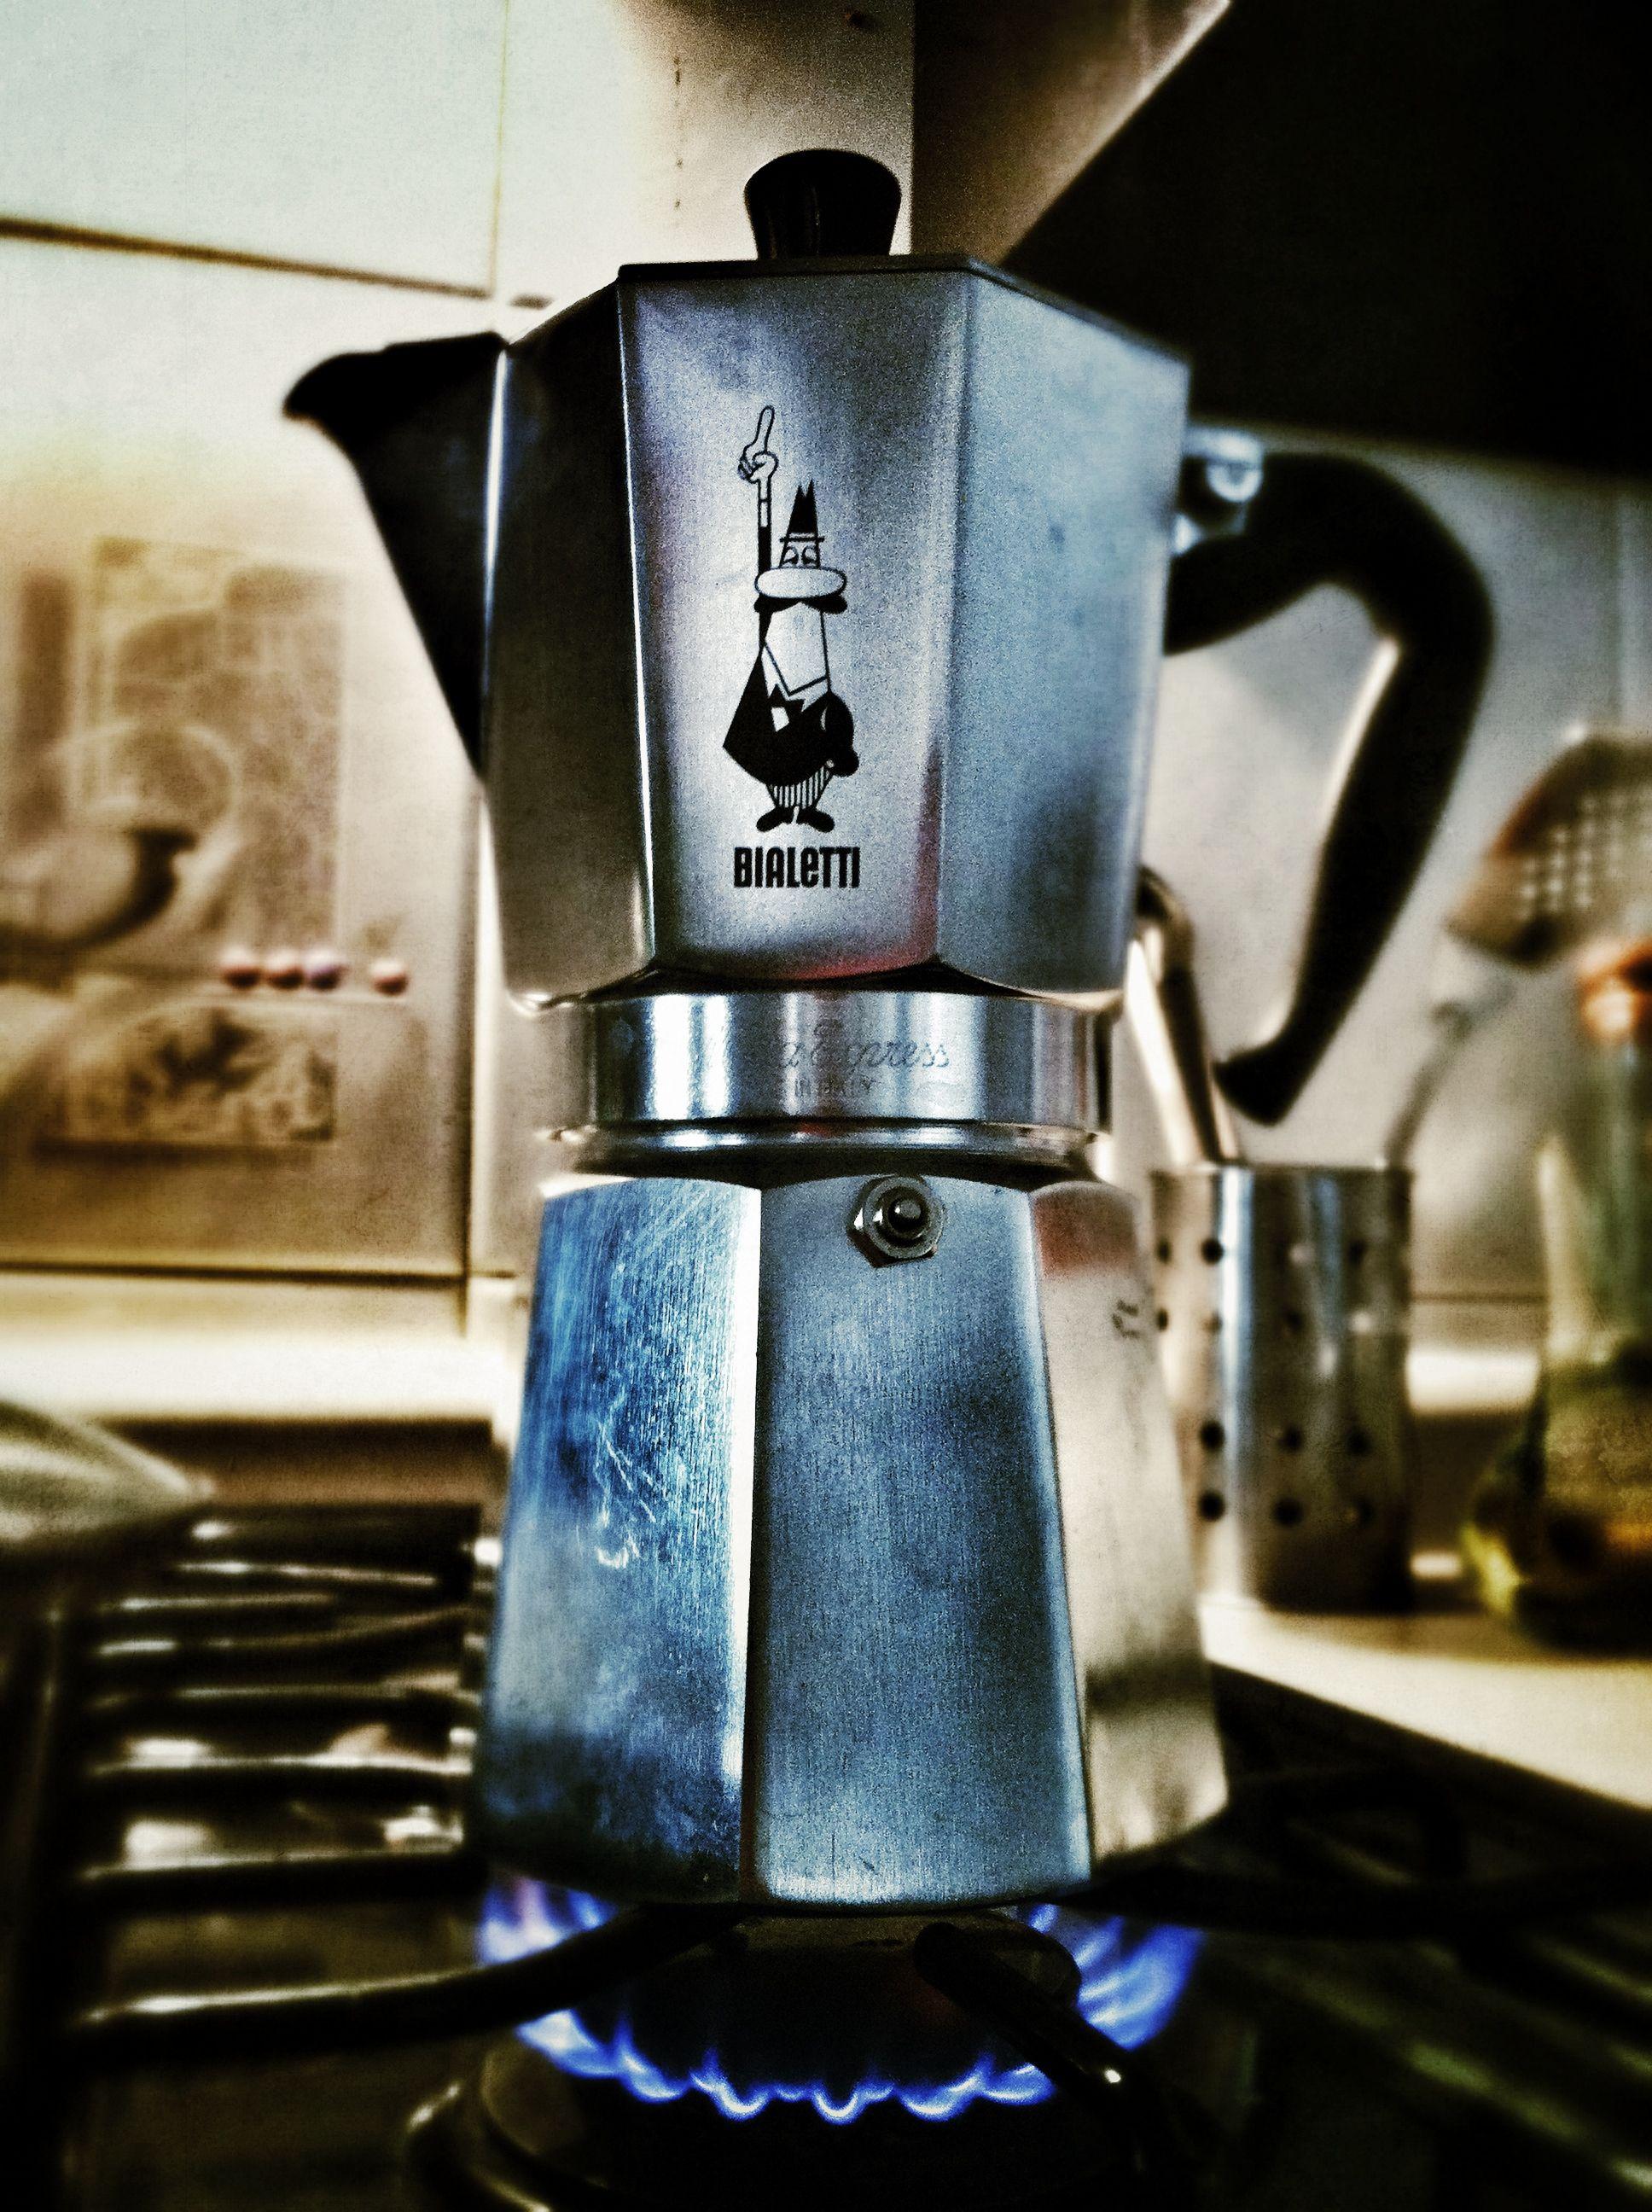 Bialetti fuckstarbucksandnespresso pinterest espresso